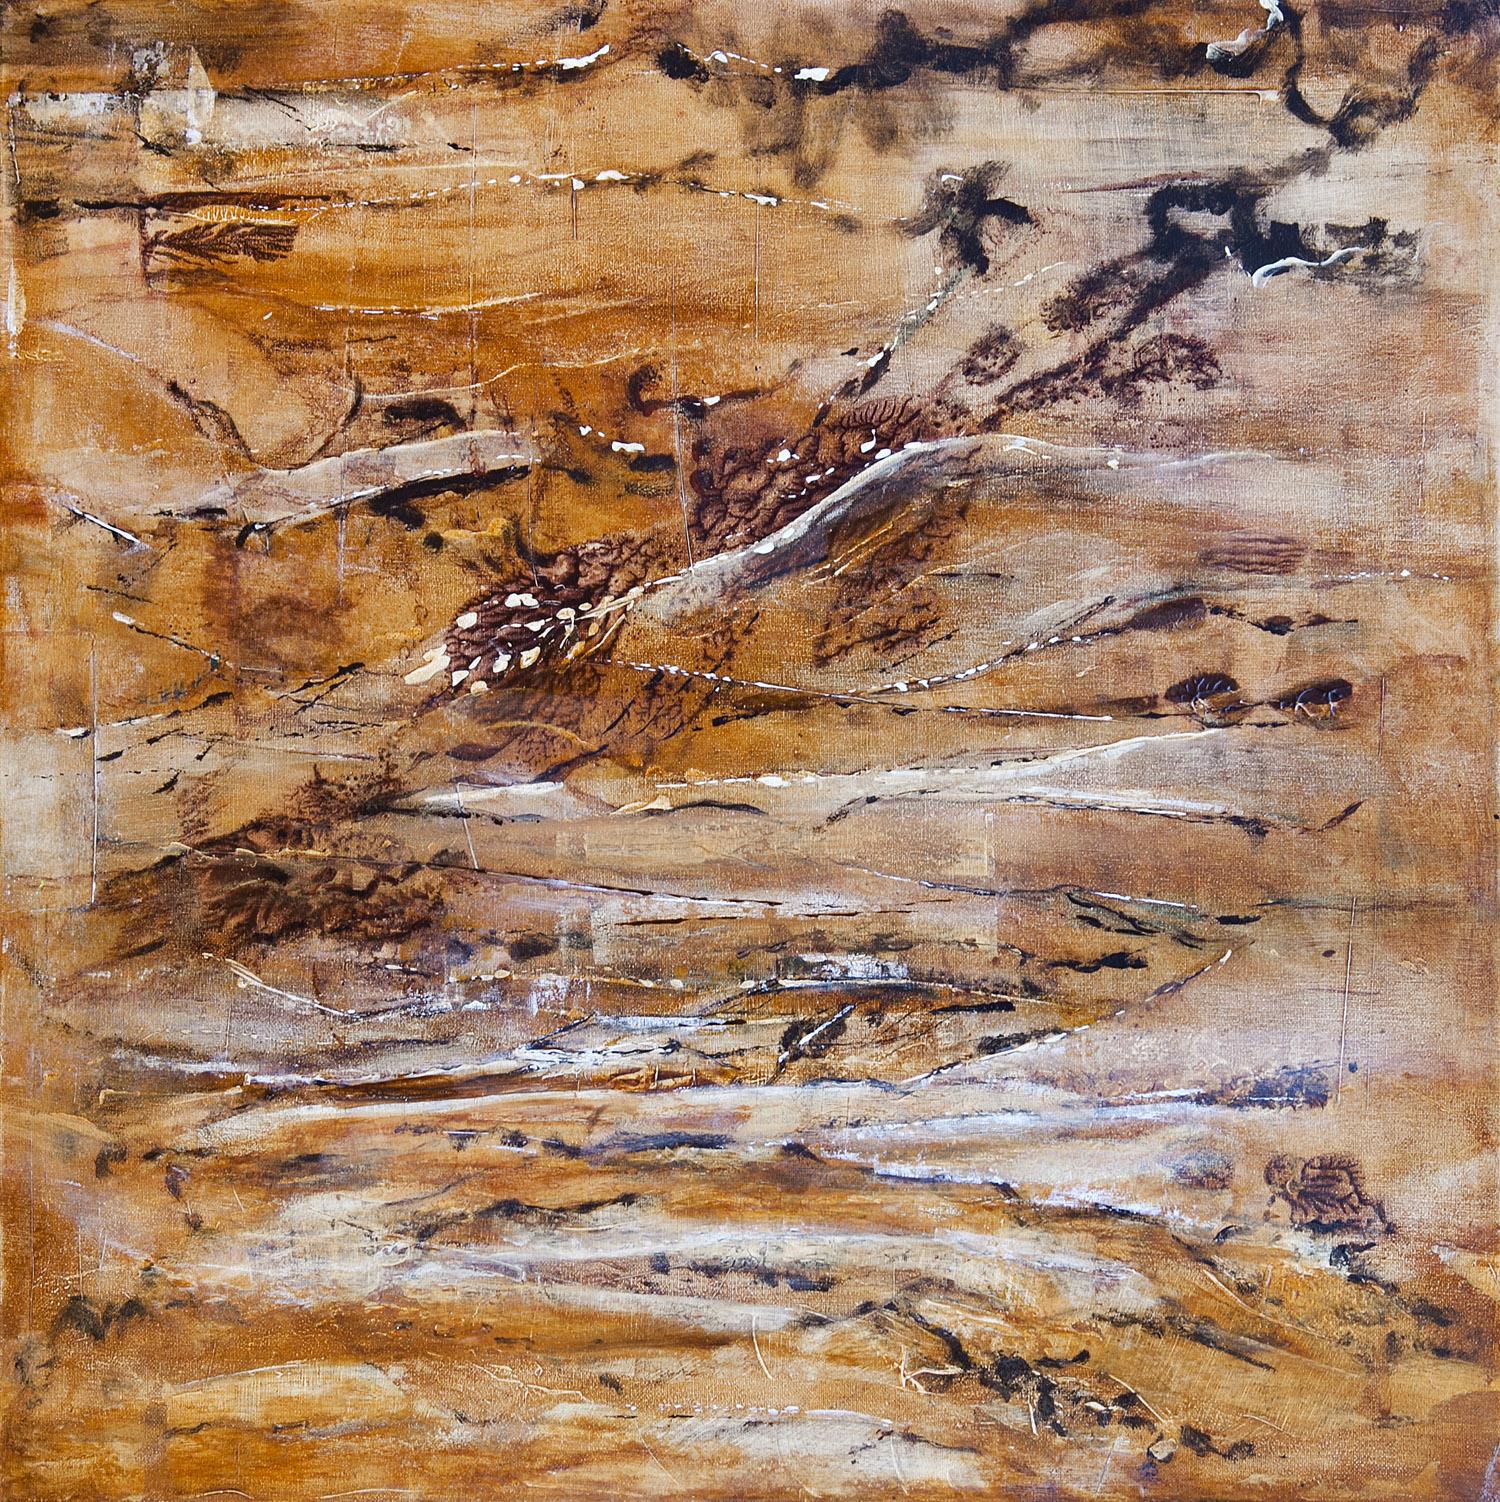 Sargazos, acrilico sobre lienzo, 50x50cm, 2014.jpg